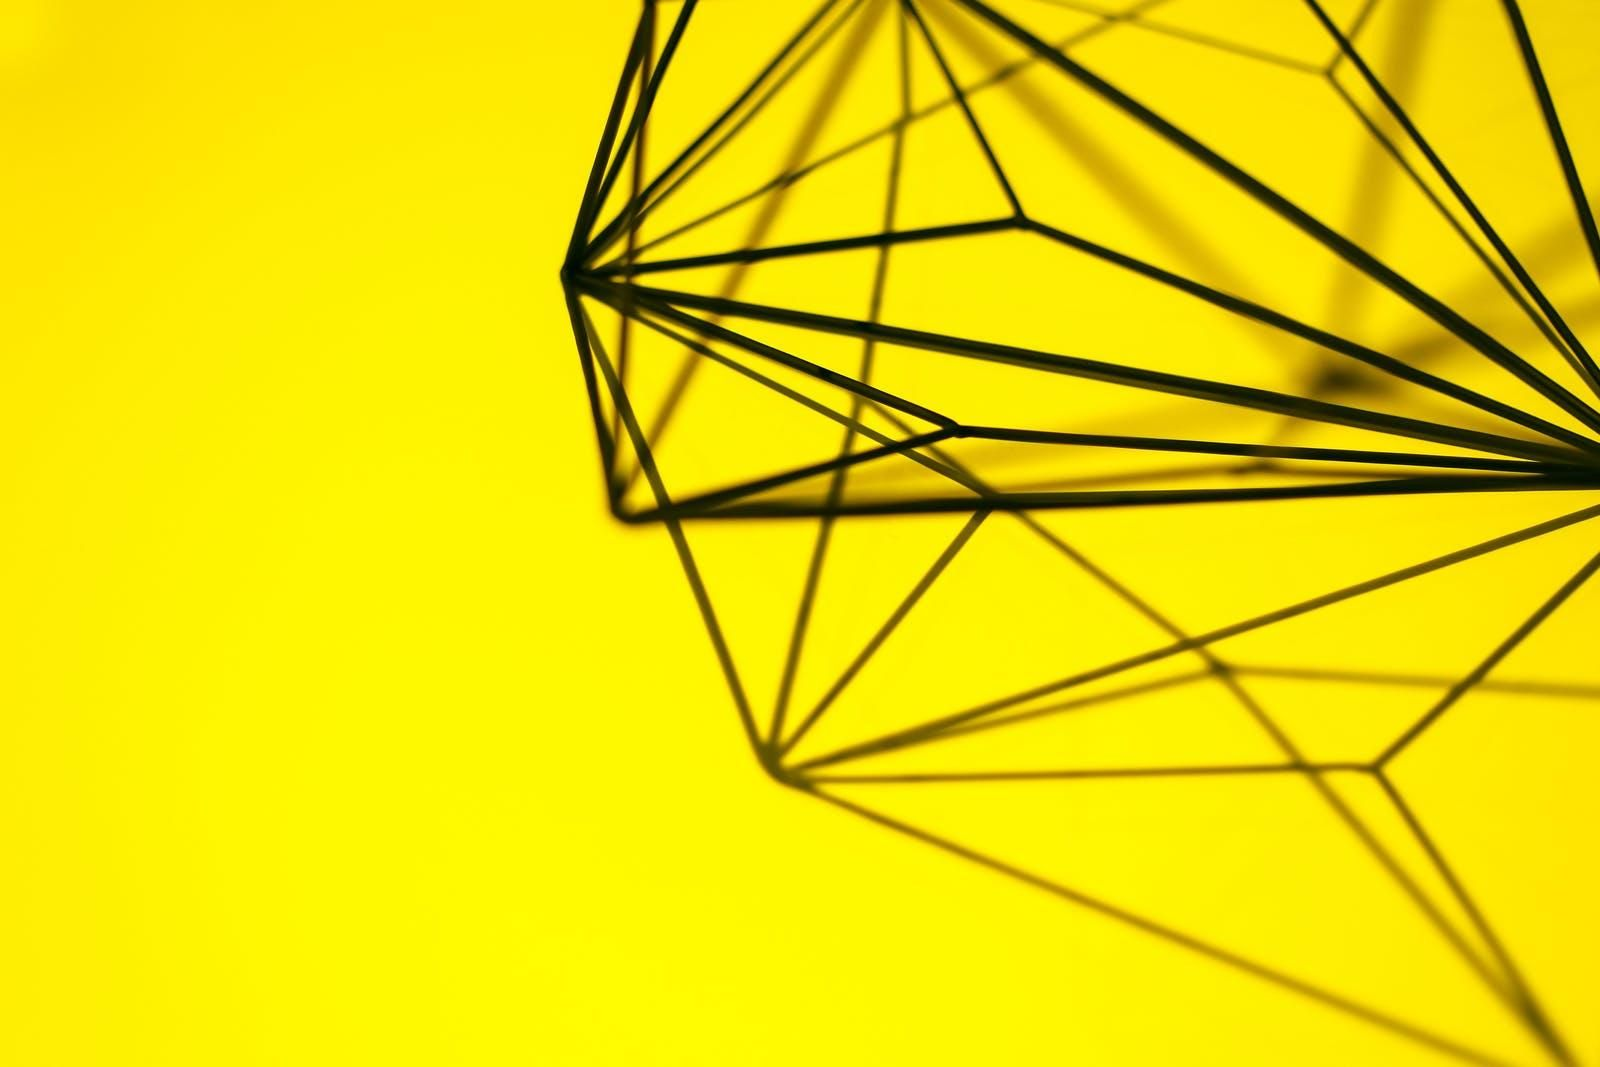 122656_yellow-metal-design-decoration.jpg